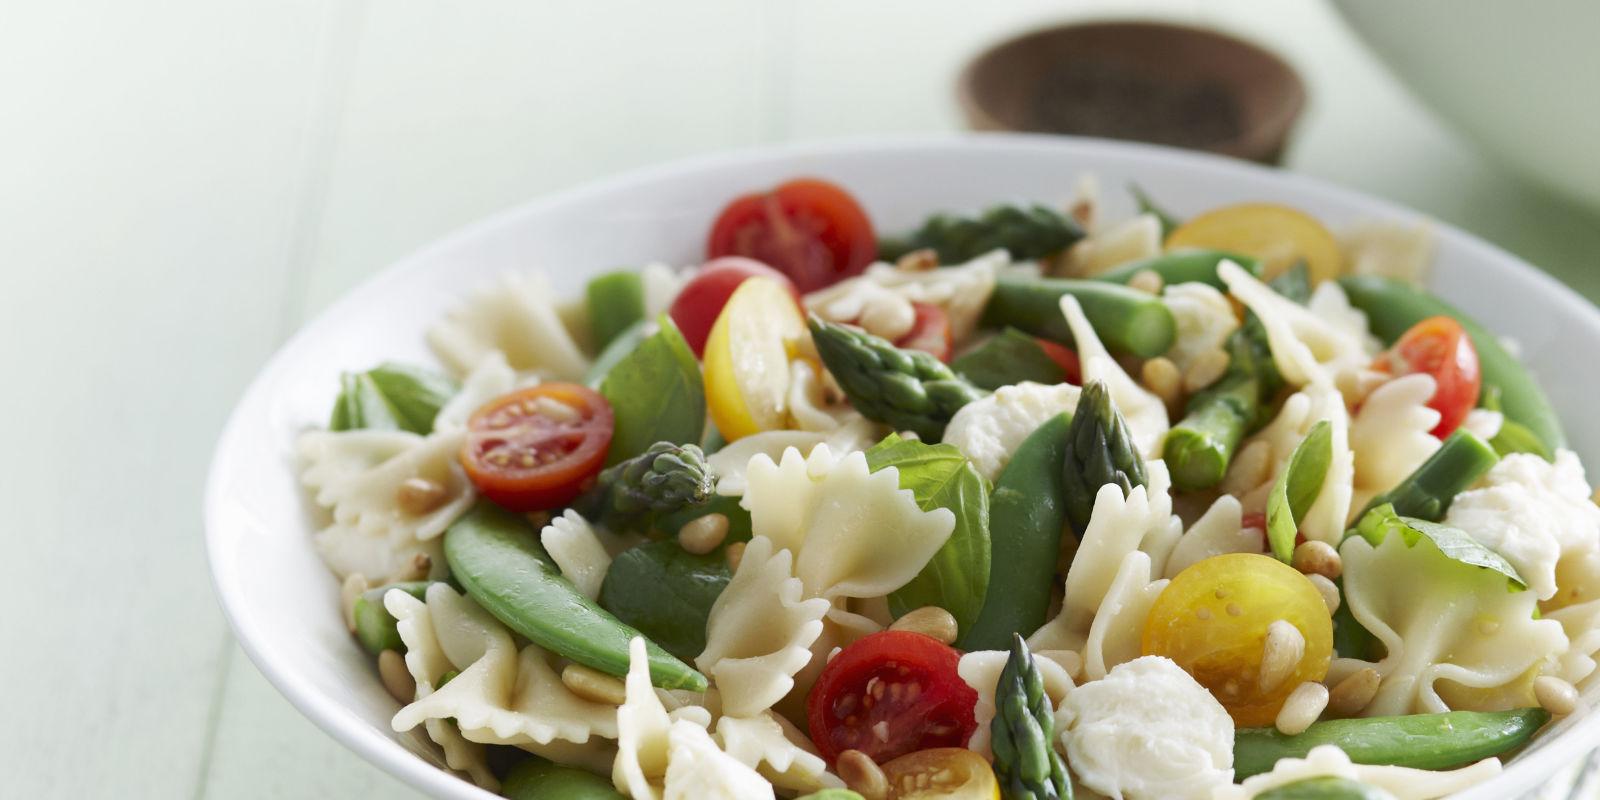 22 Summer Pasta Salad Recipes Easy Ideas For Cold Pasta